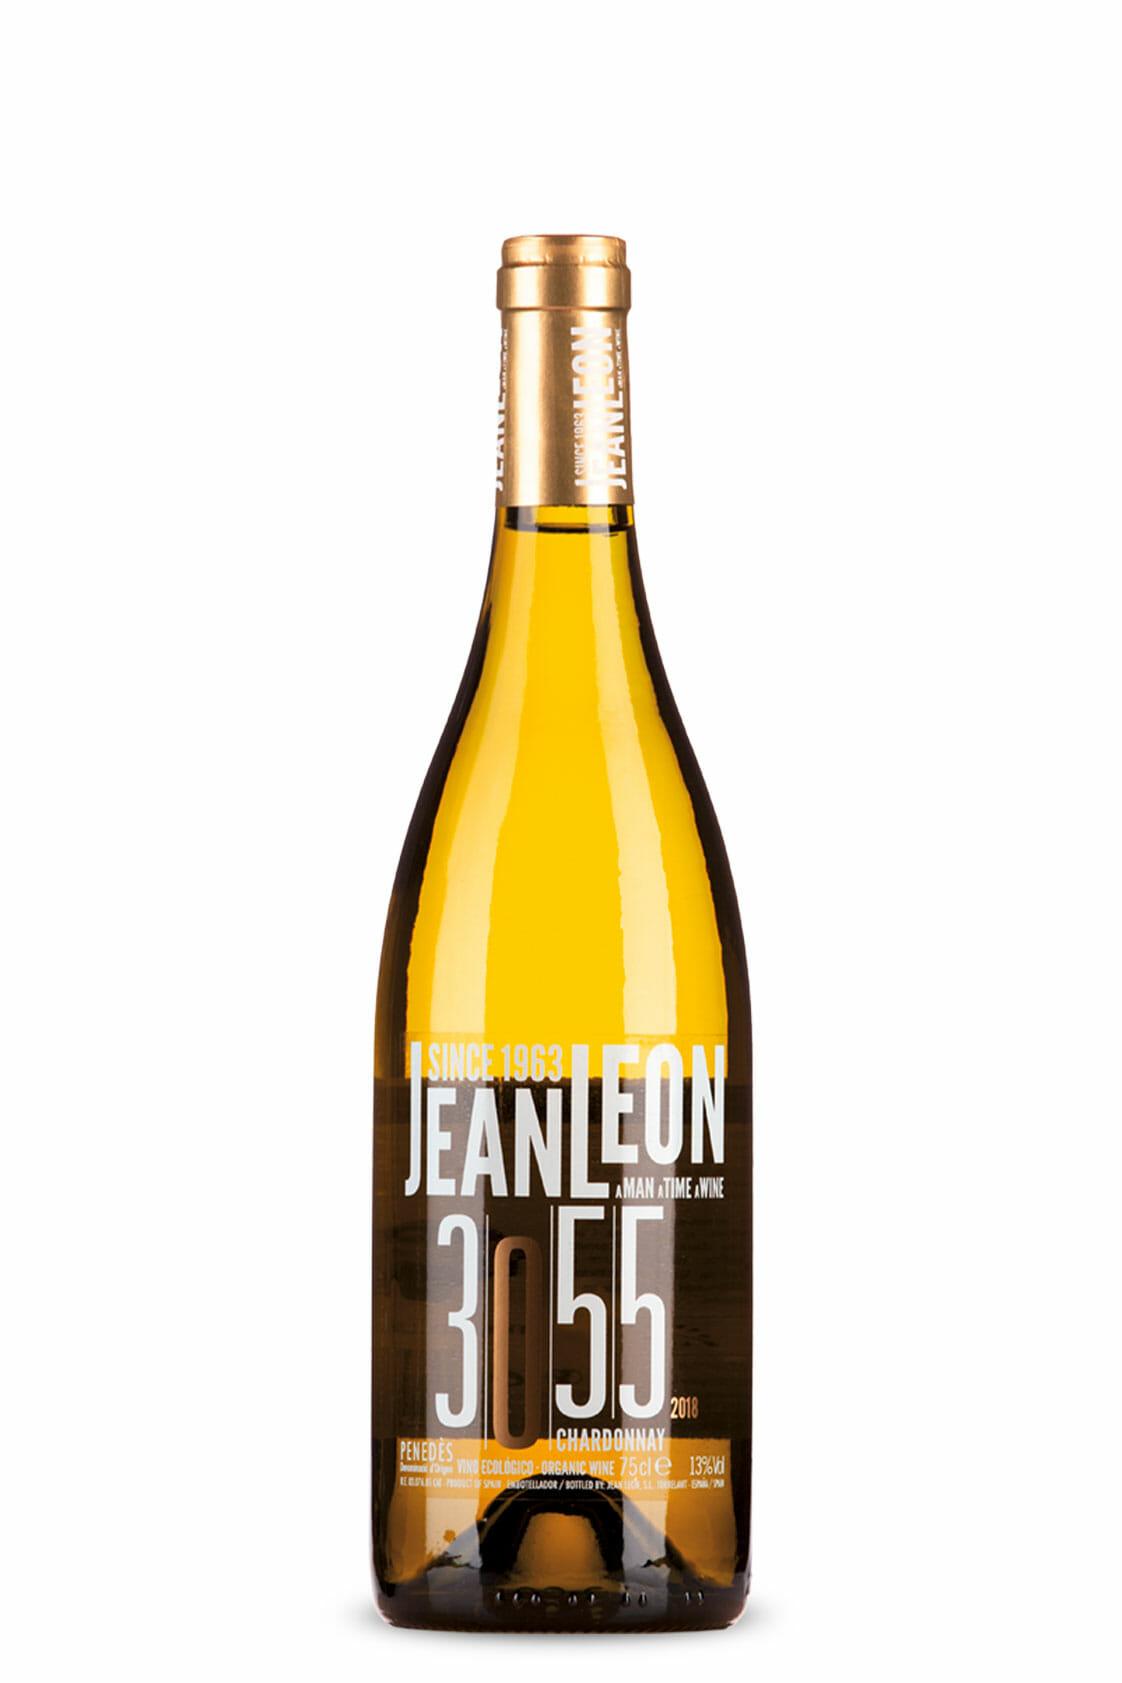 Jean Leon '3055' Chardonnay 2019 – Jean Leon